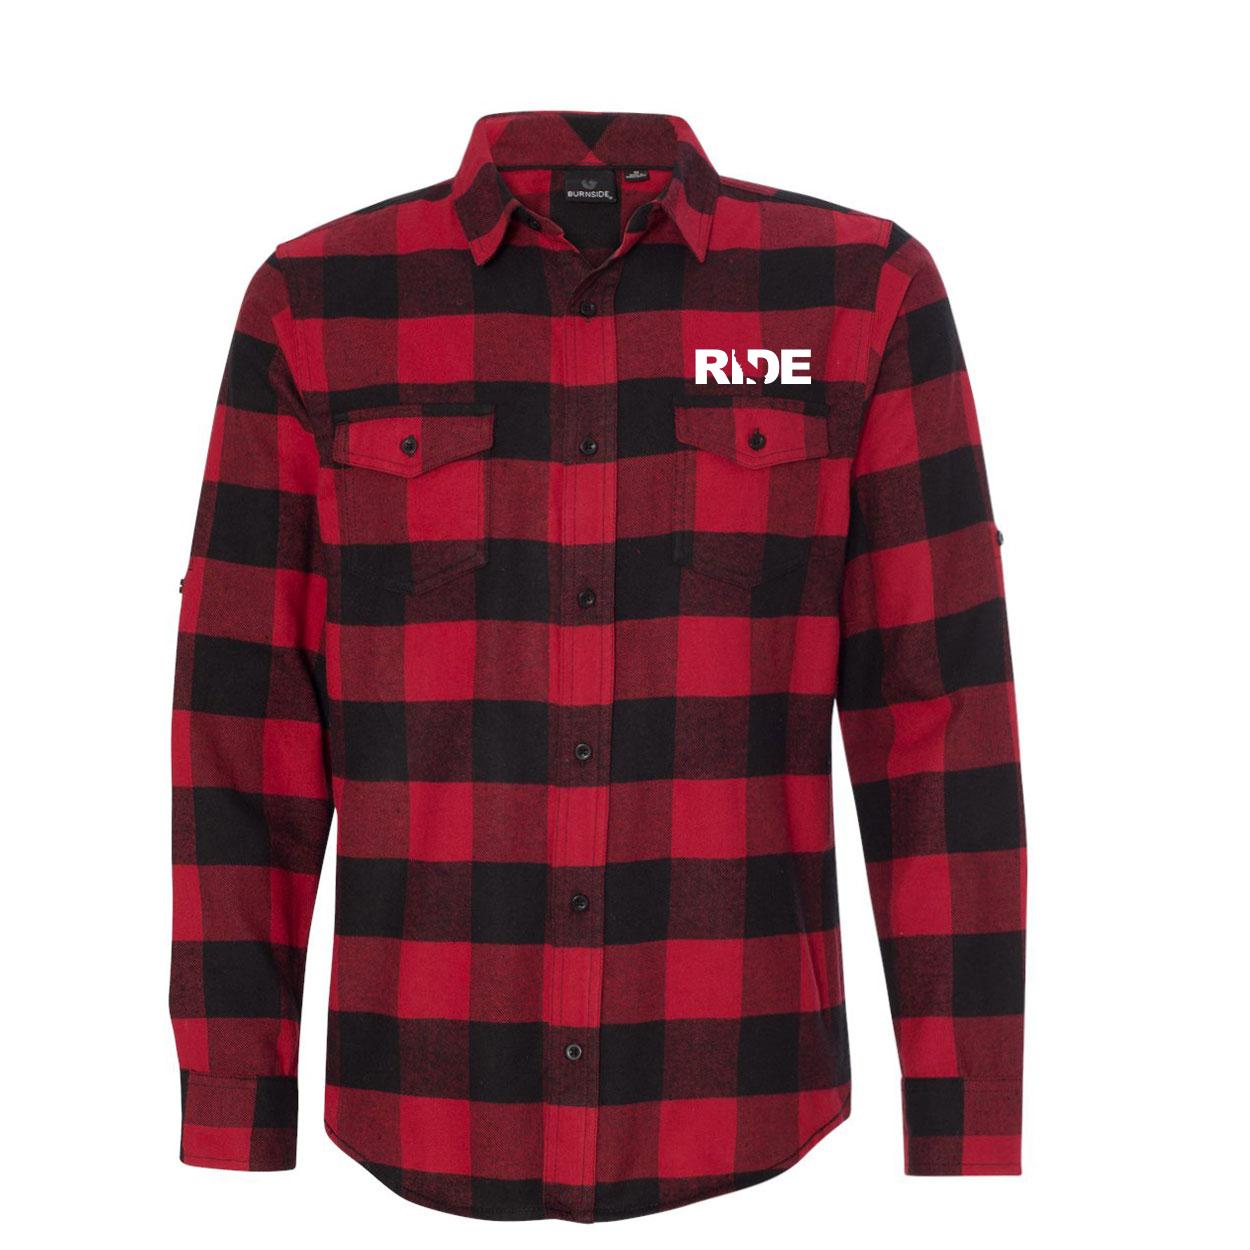 Ride California Classic Unisex Long Sleeve Flannel Shirt Red/Black Buffalo (White Logo)